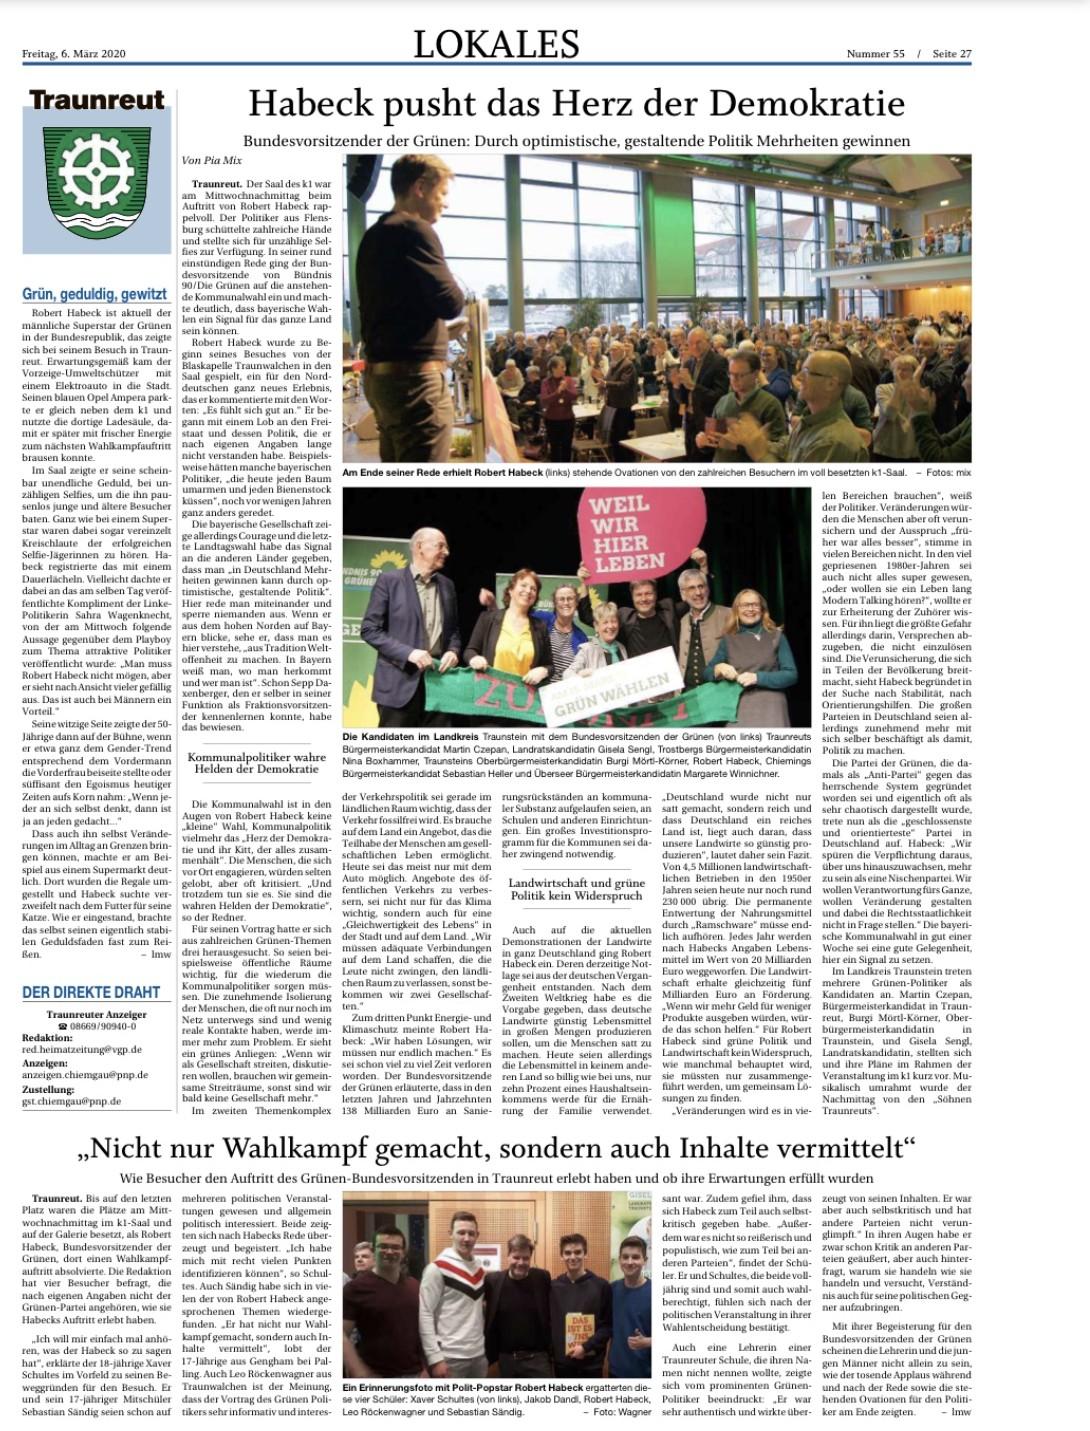 Trostberger Tagblatt 06.03.2020 Habeck